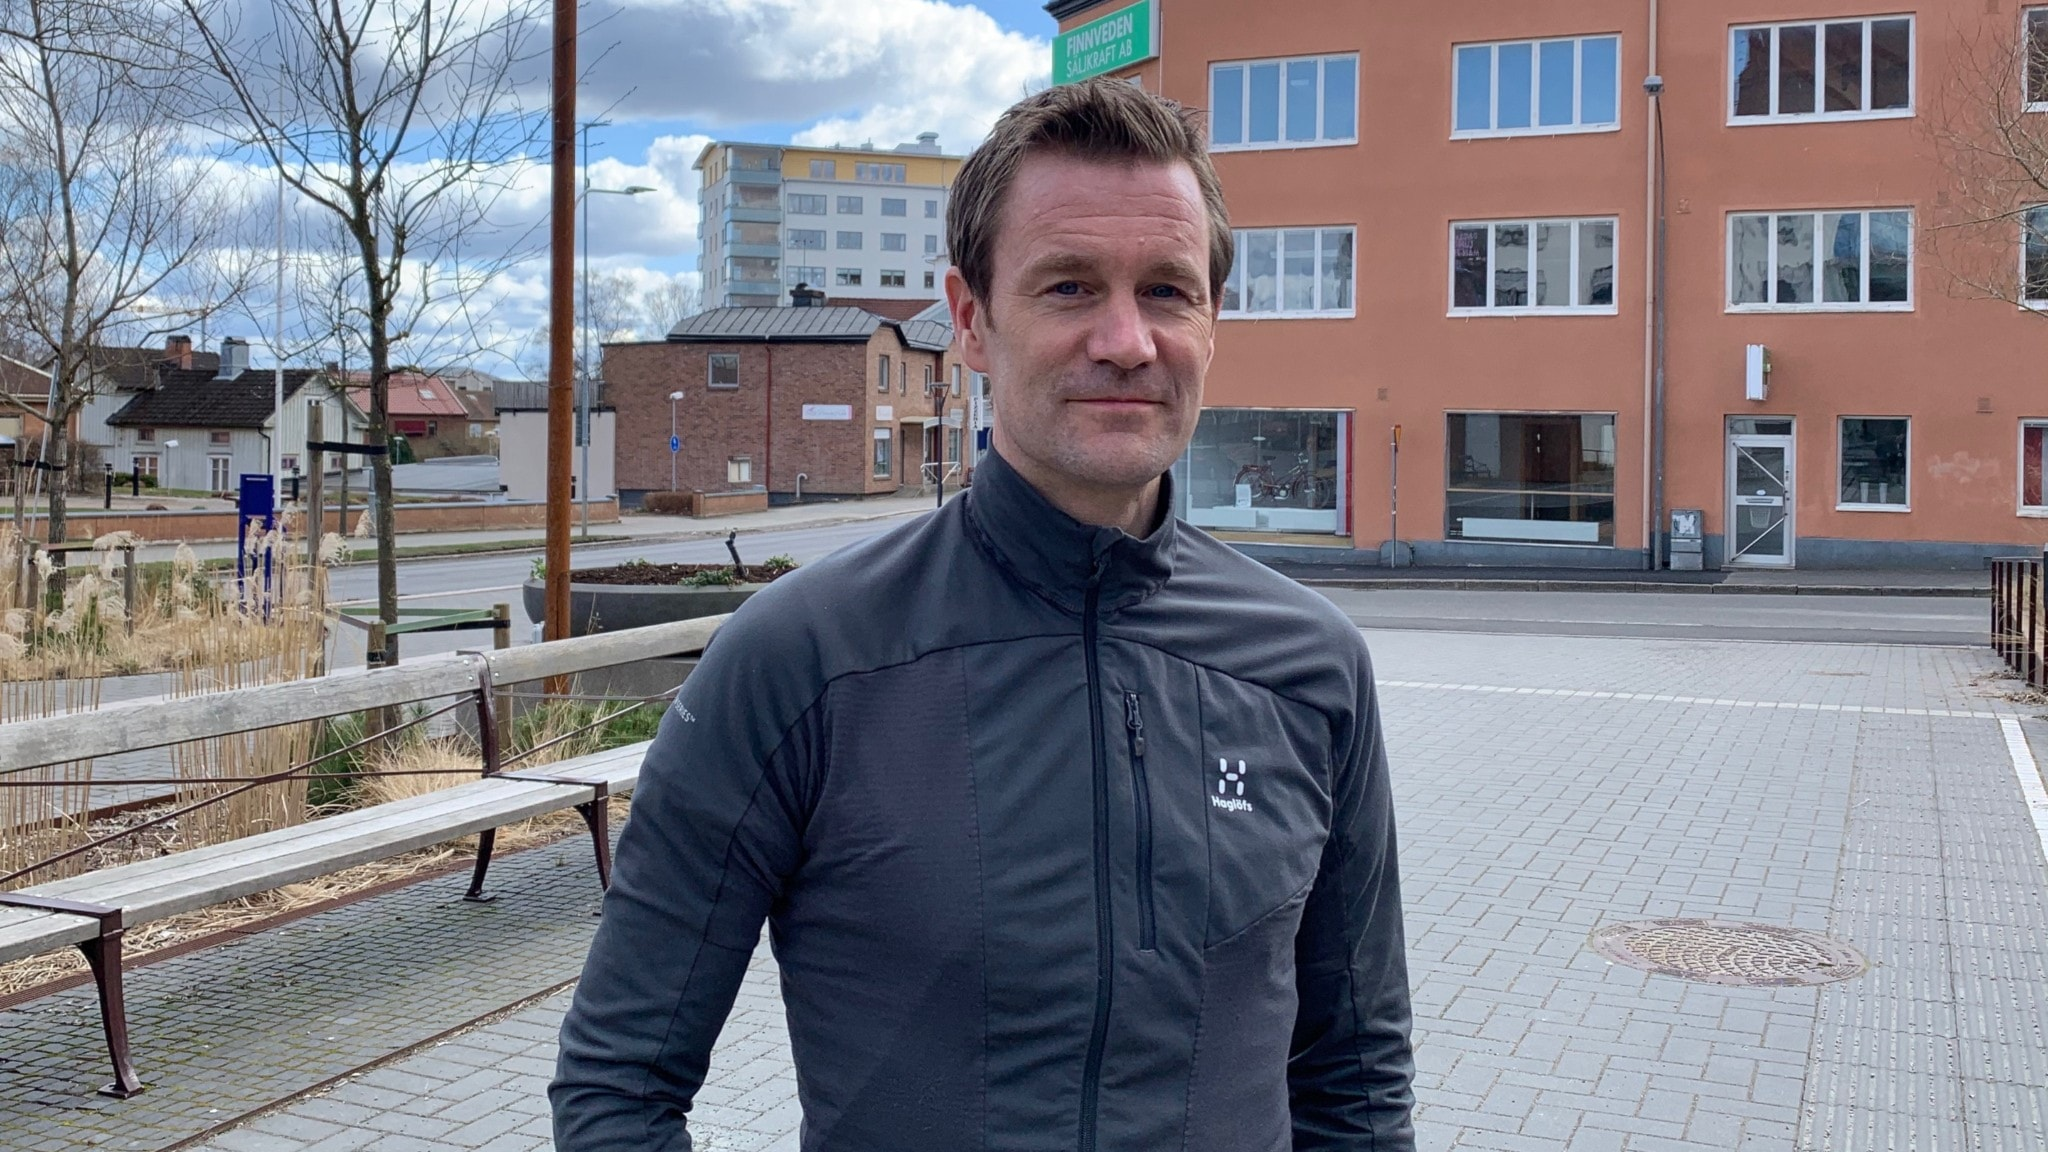 Johan Gustafsson ståendes utomhus